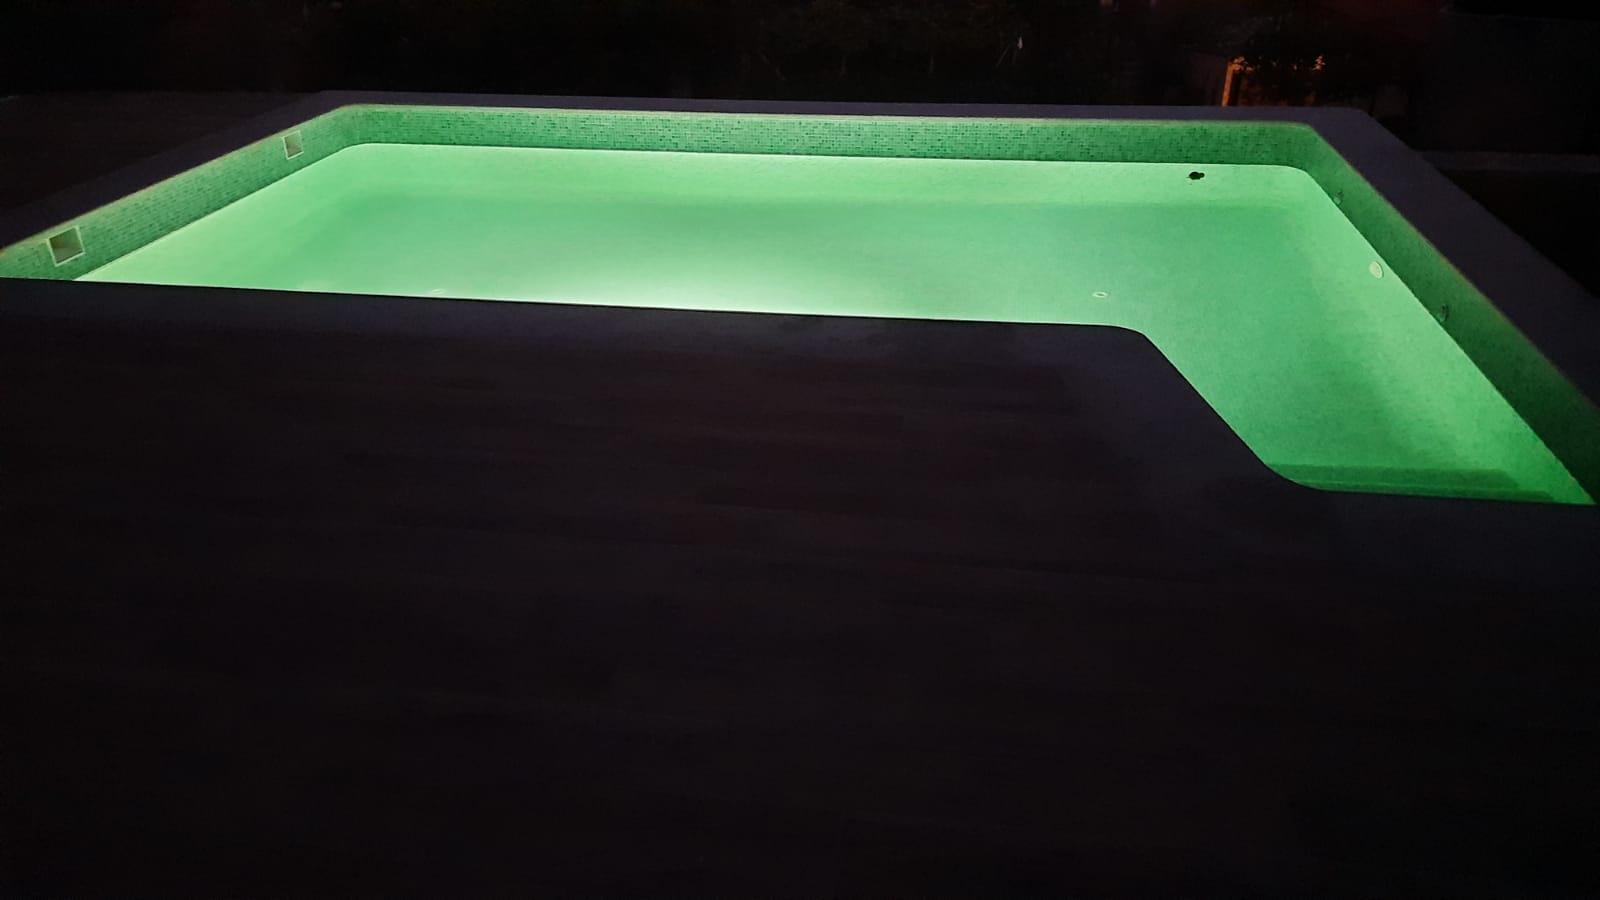 piscina 7x4 elifra